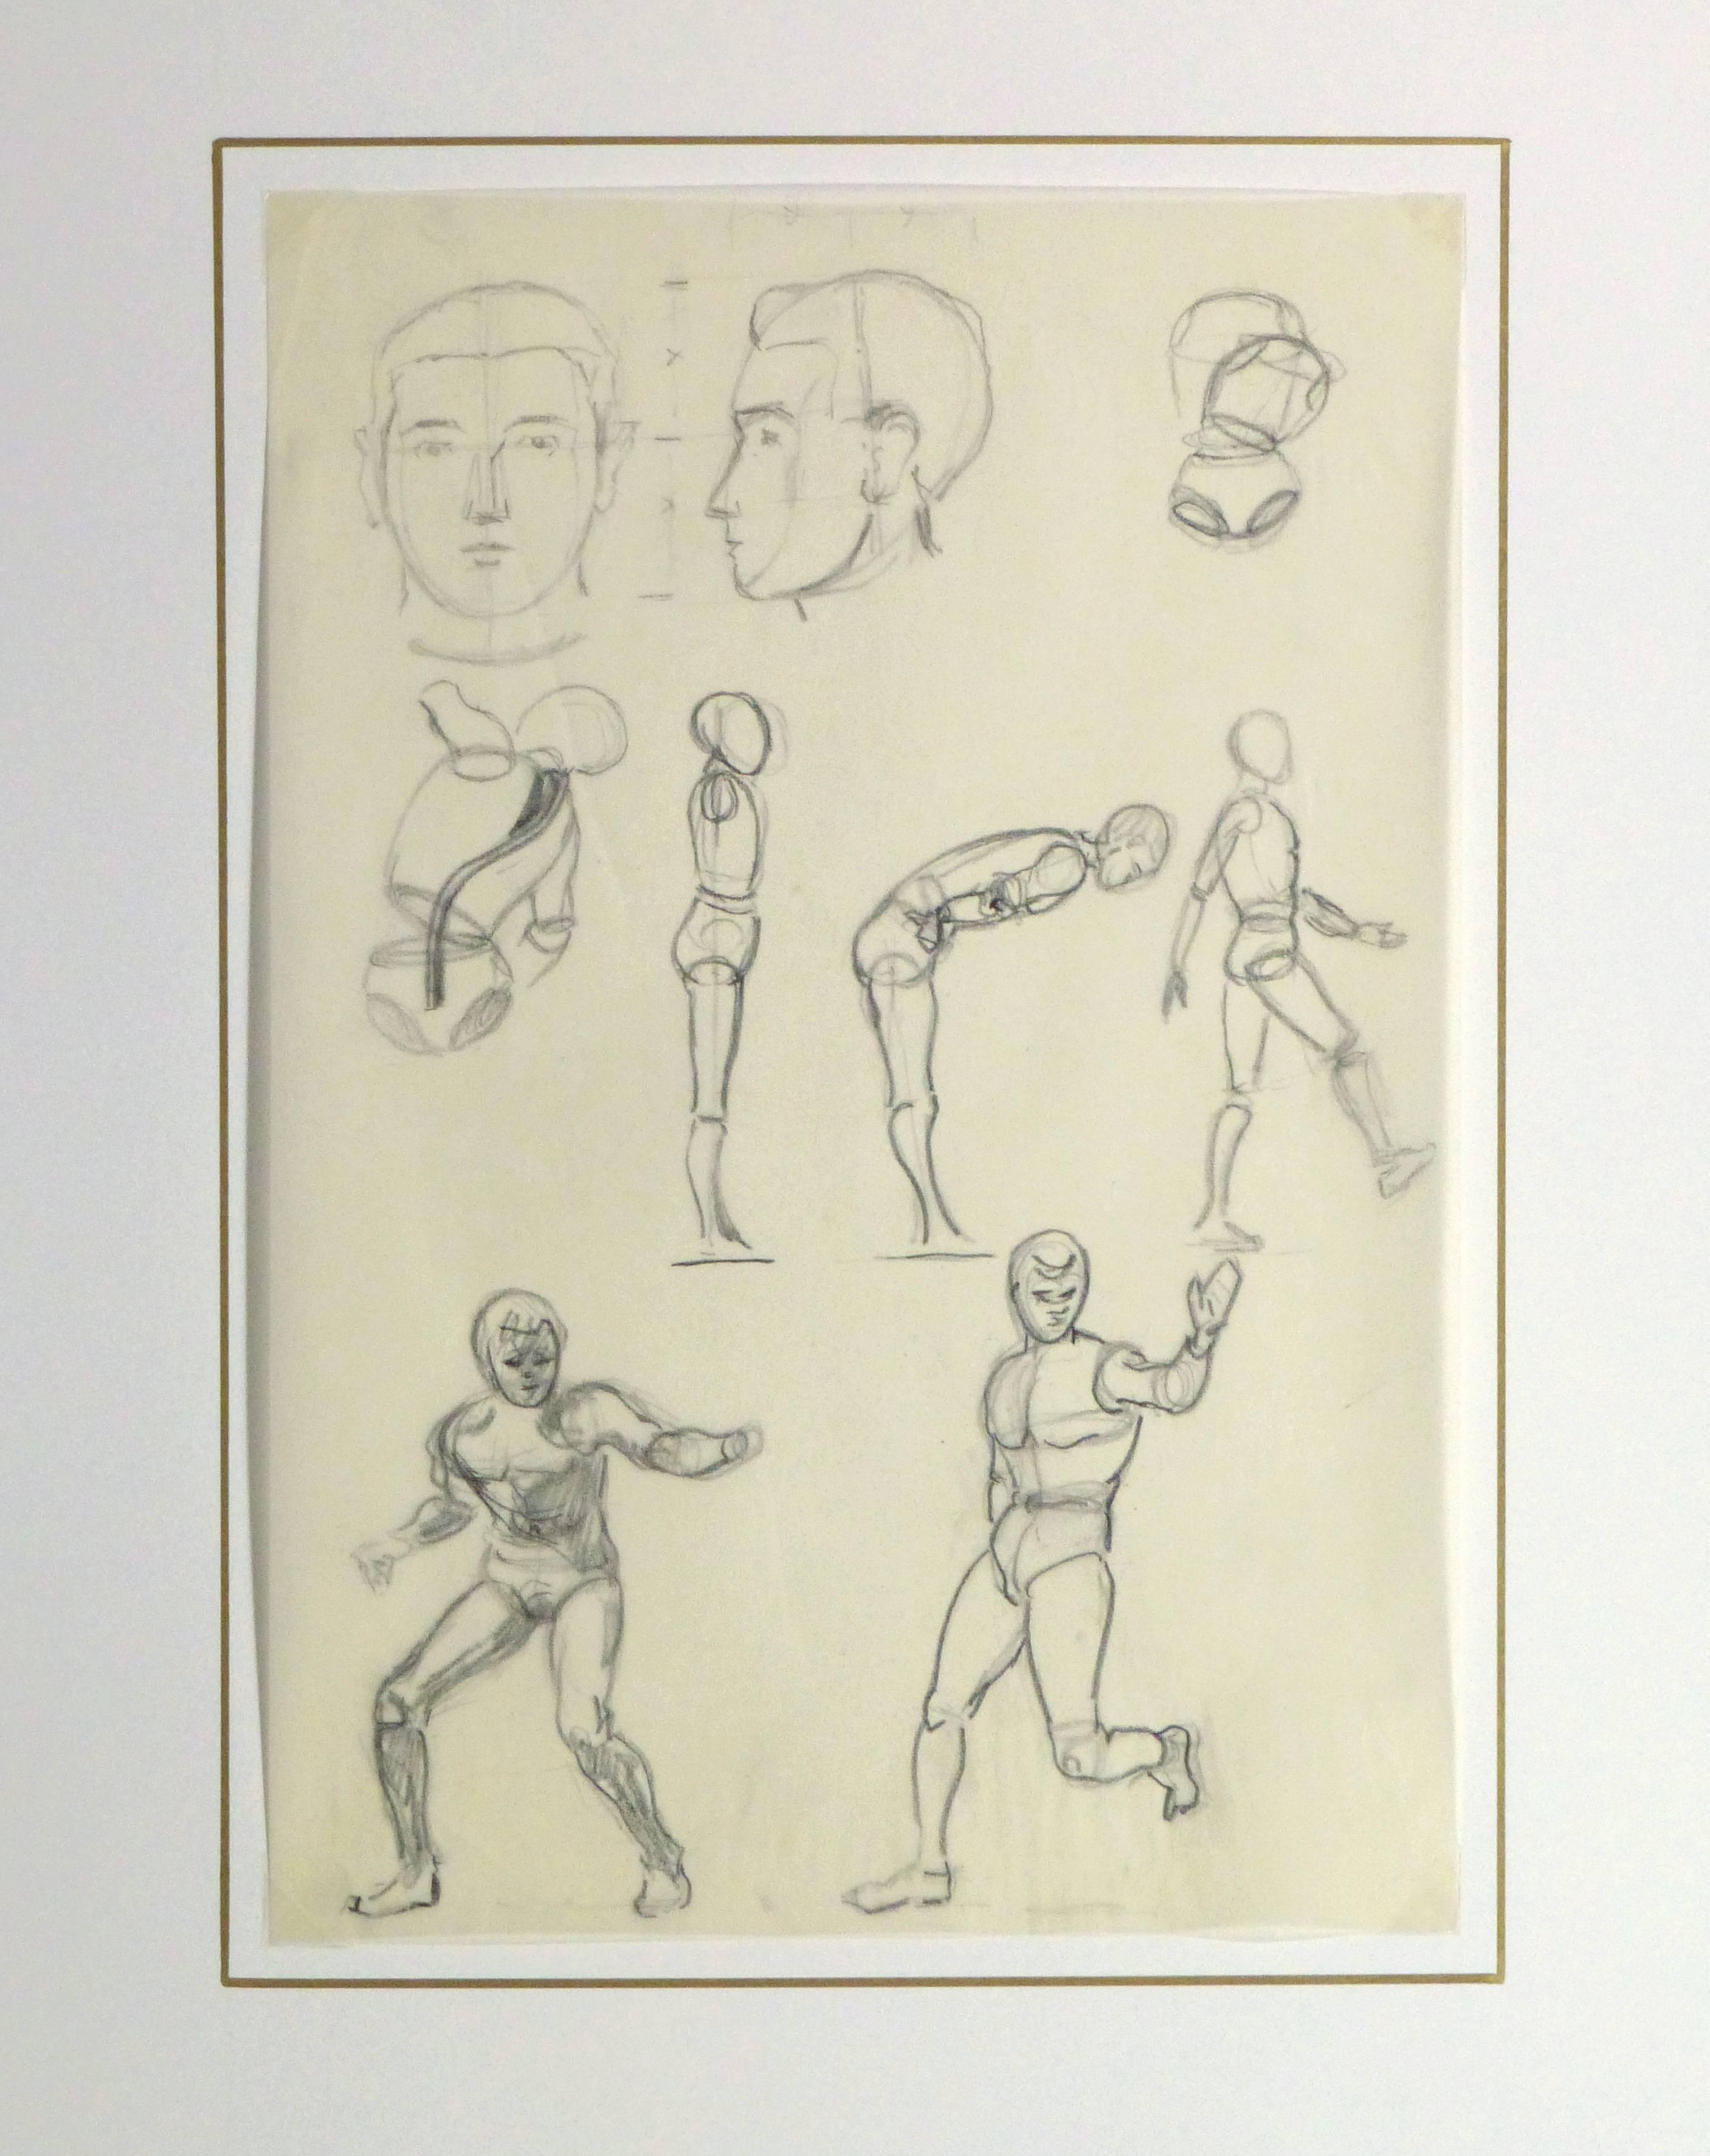 Werner bell pencil sketch figure